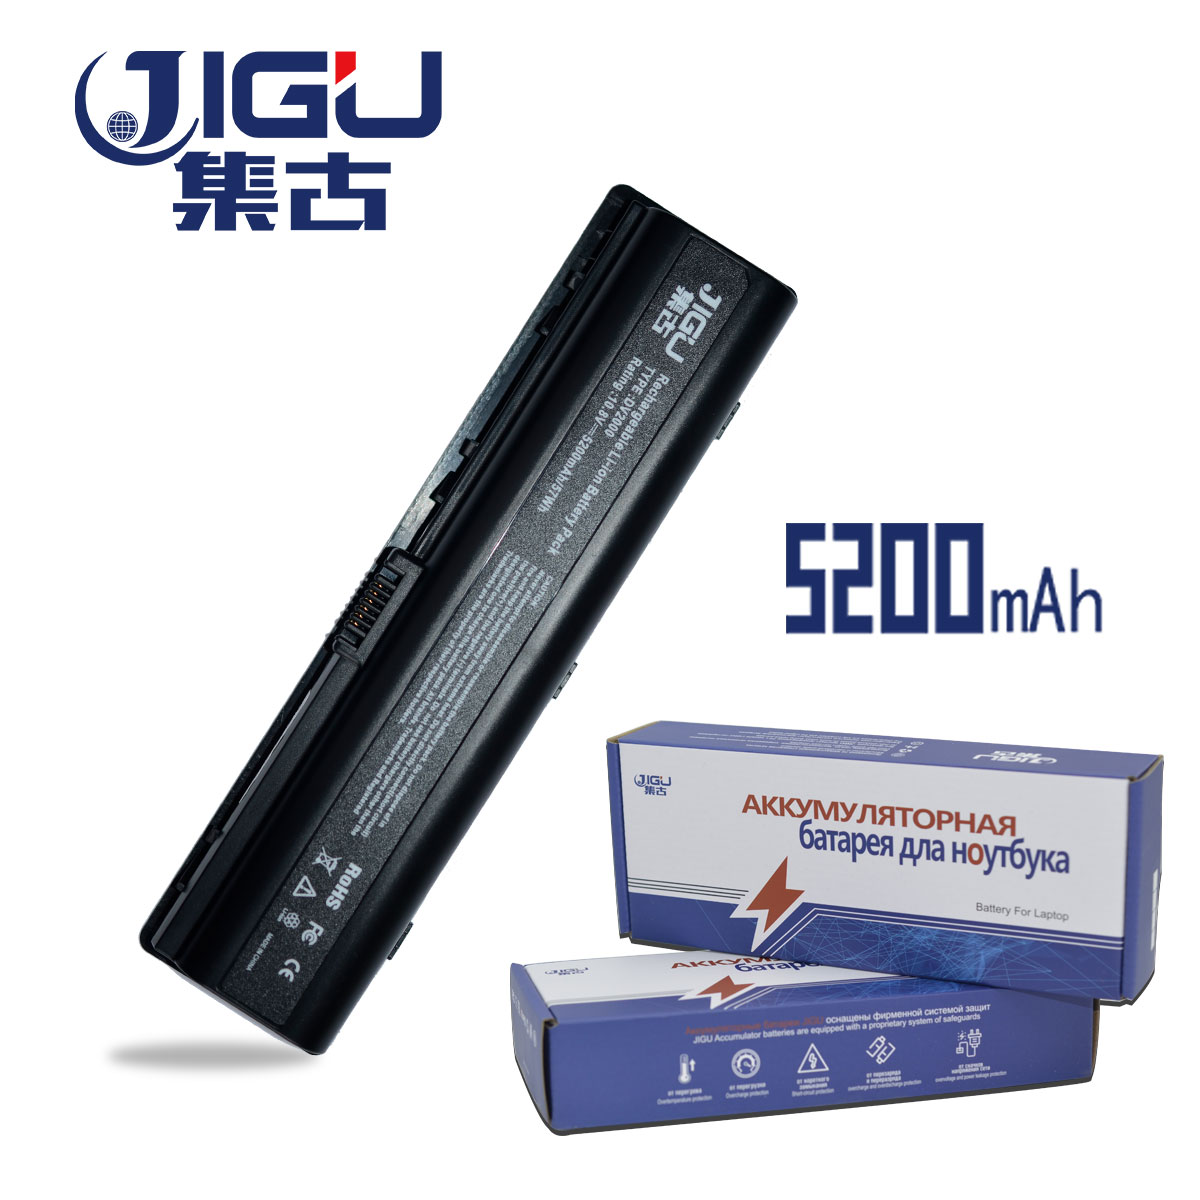 JIGU New Laptop Battery For HP COMPAQ Presario C700 V3000 F500 DV2000 HSTNN-DB42 HSTNN-LB42 HSTNN-LB42 HSTNN-OB31 laptop keyboard for hp compaq presario c700 454954 001 notebook keyboard